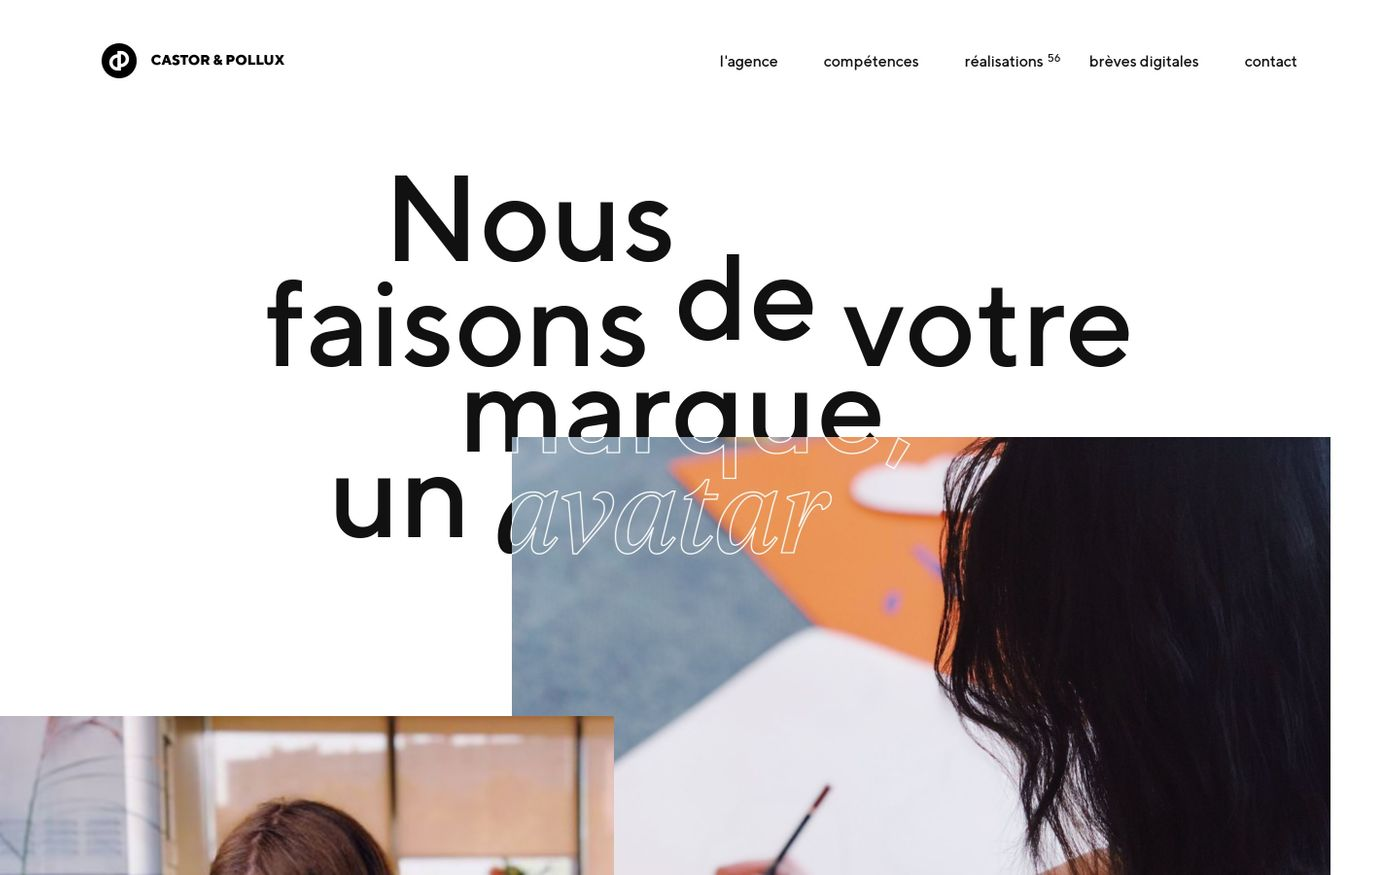 Screenshot of Castor & Pollux website